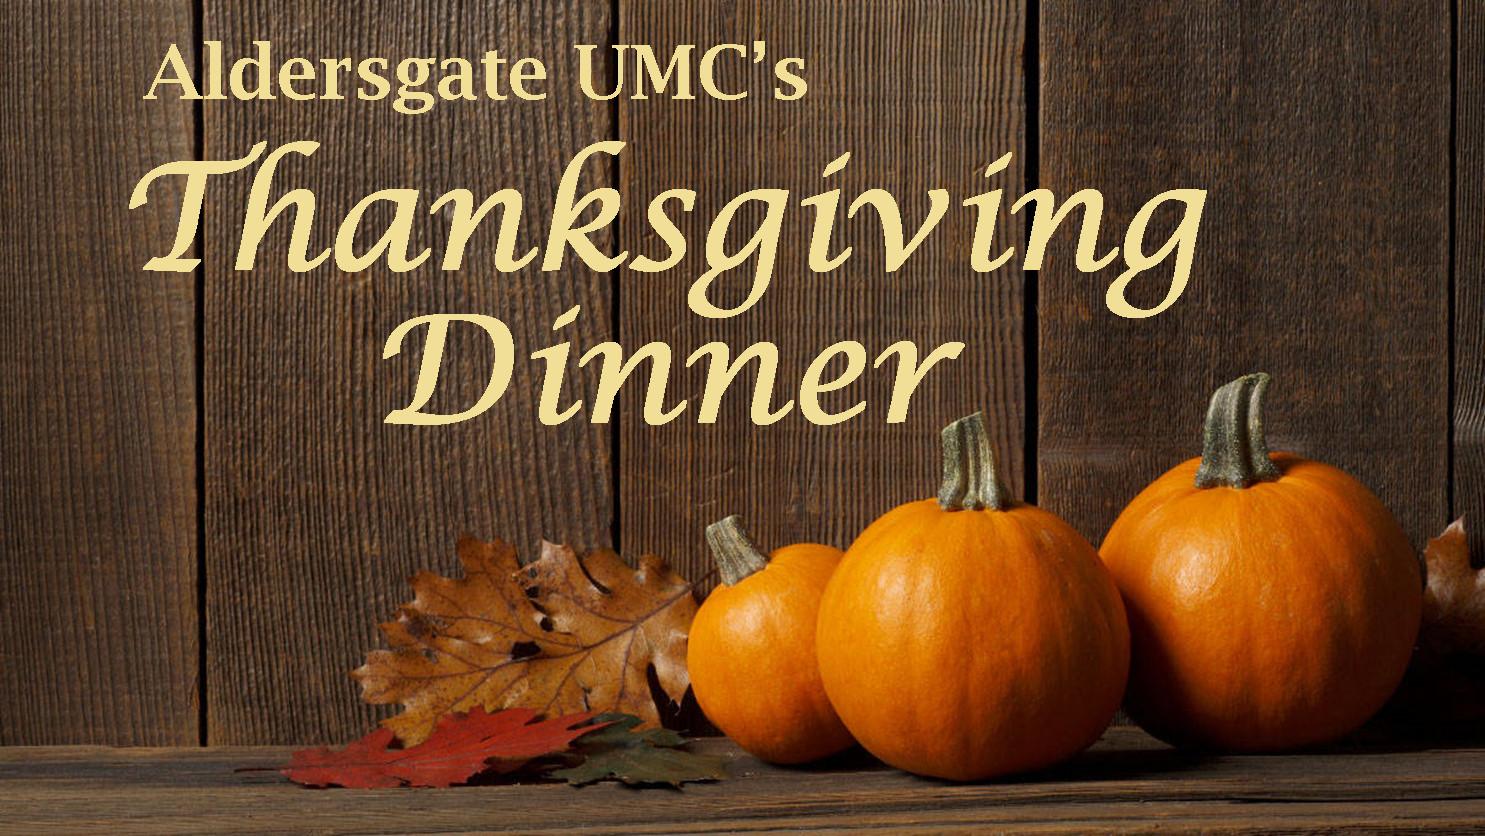 Church Thanksgiving Dinner  Thanksgiving Dinner Aldersgate United Methodist Church